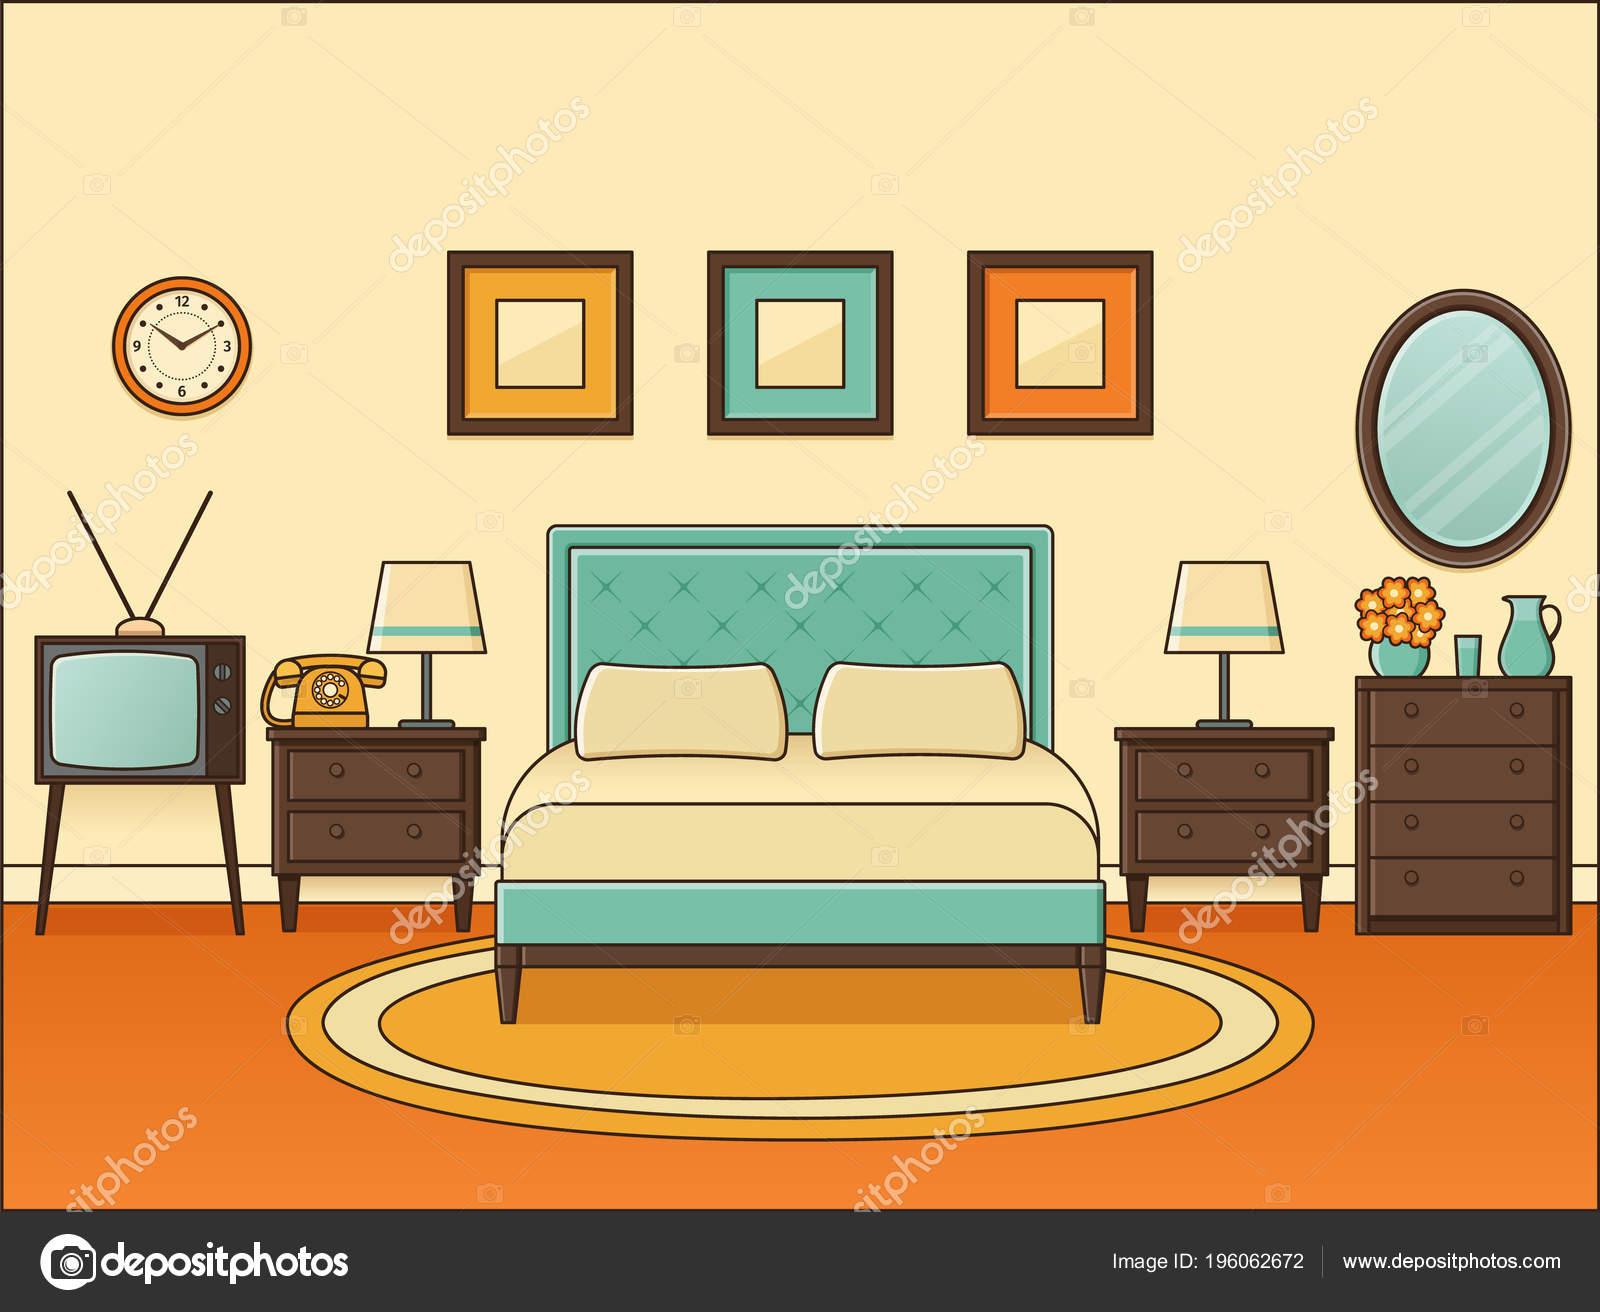 Room Double Bed Bedroom Retro Interior Vector Home Space